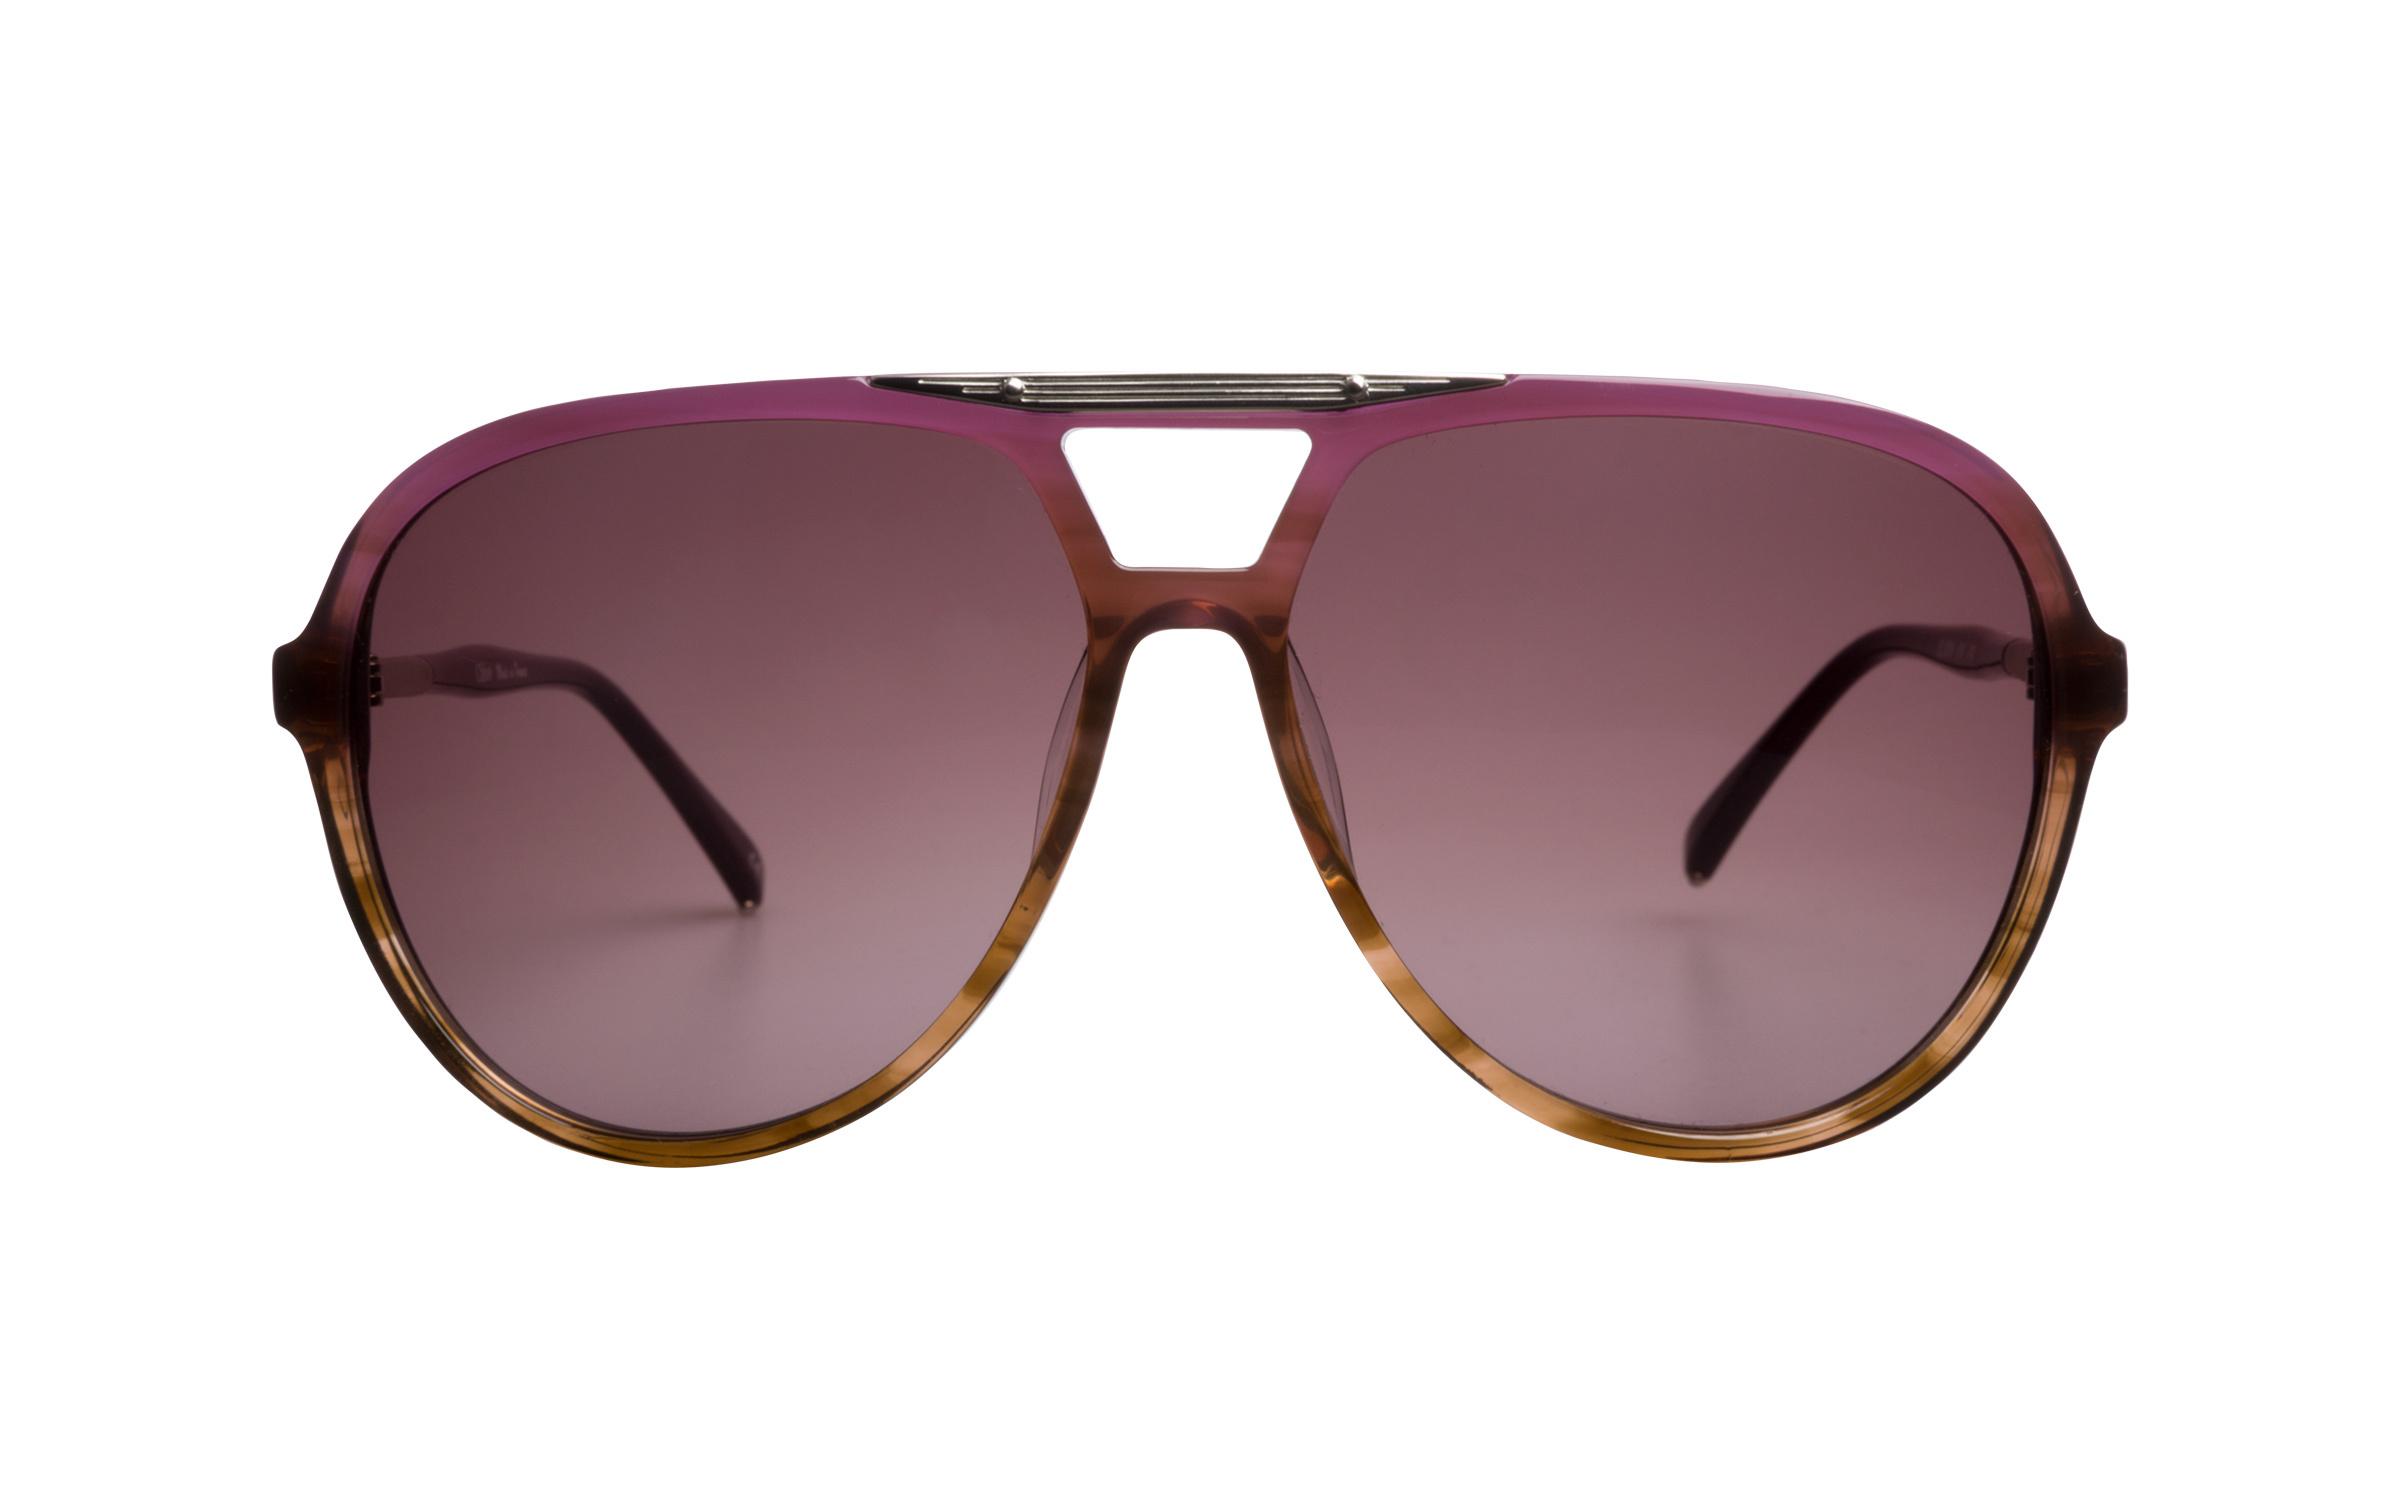 Chloe_Purple_PlasticMetal_Aviator_Sunglasses__Clearly_Glasses_Online